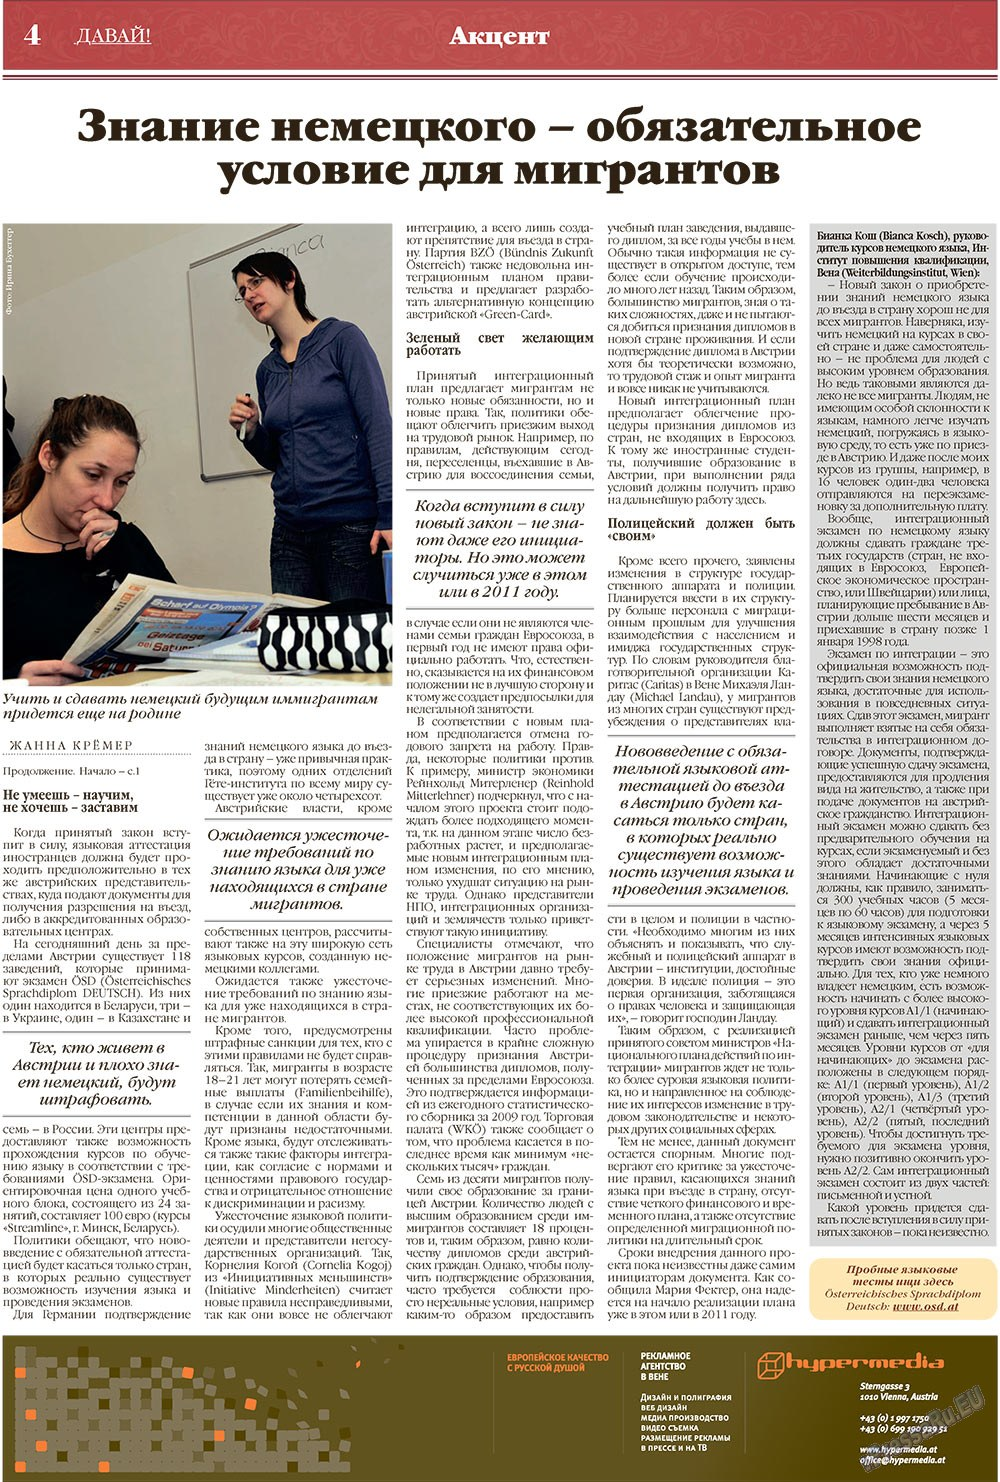 Давай (газета). 2010 год, номер 2, стр. 4